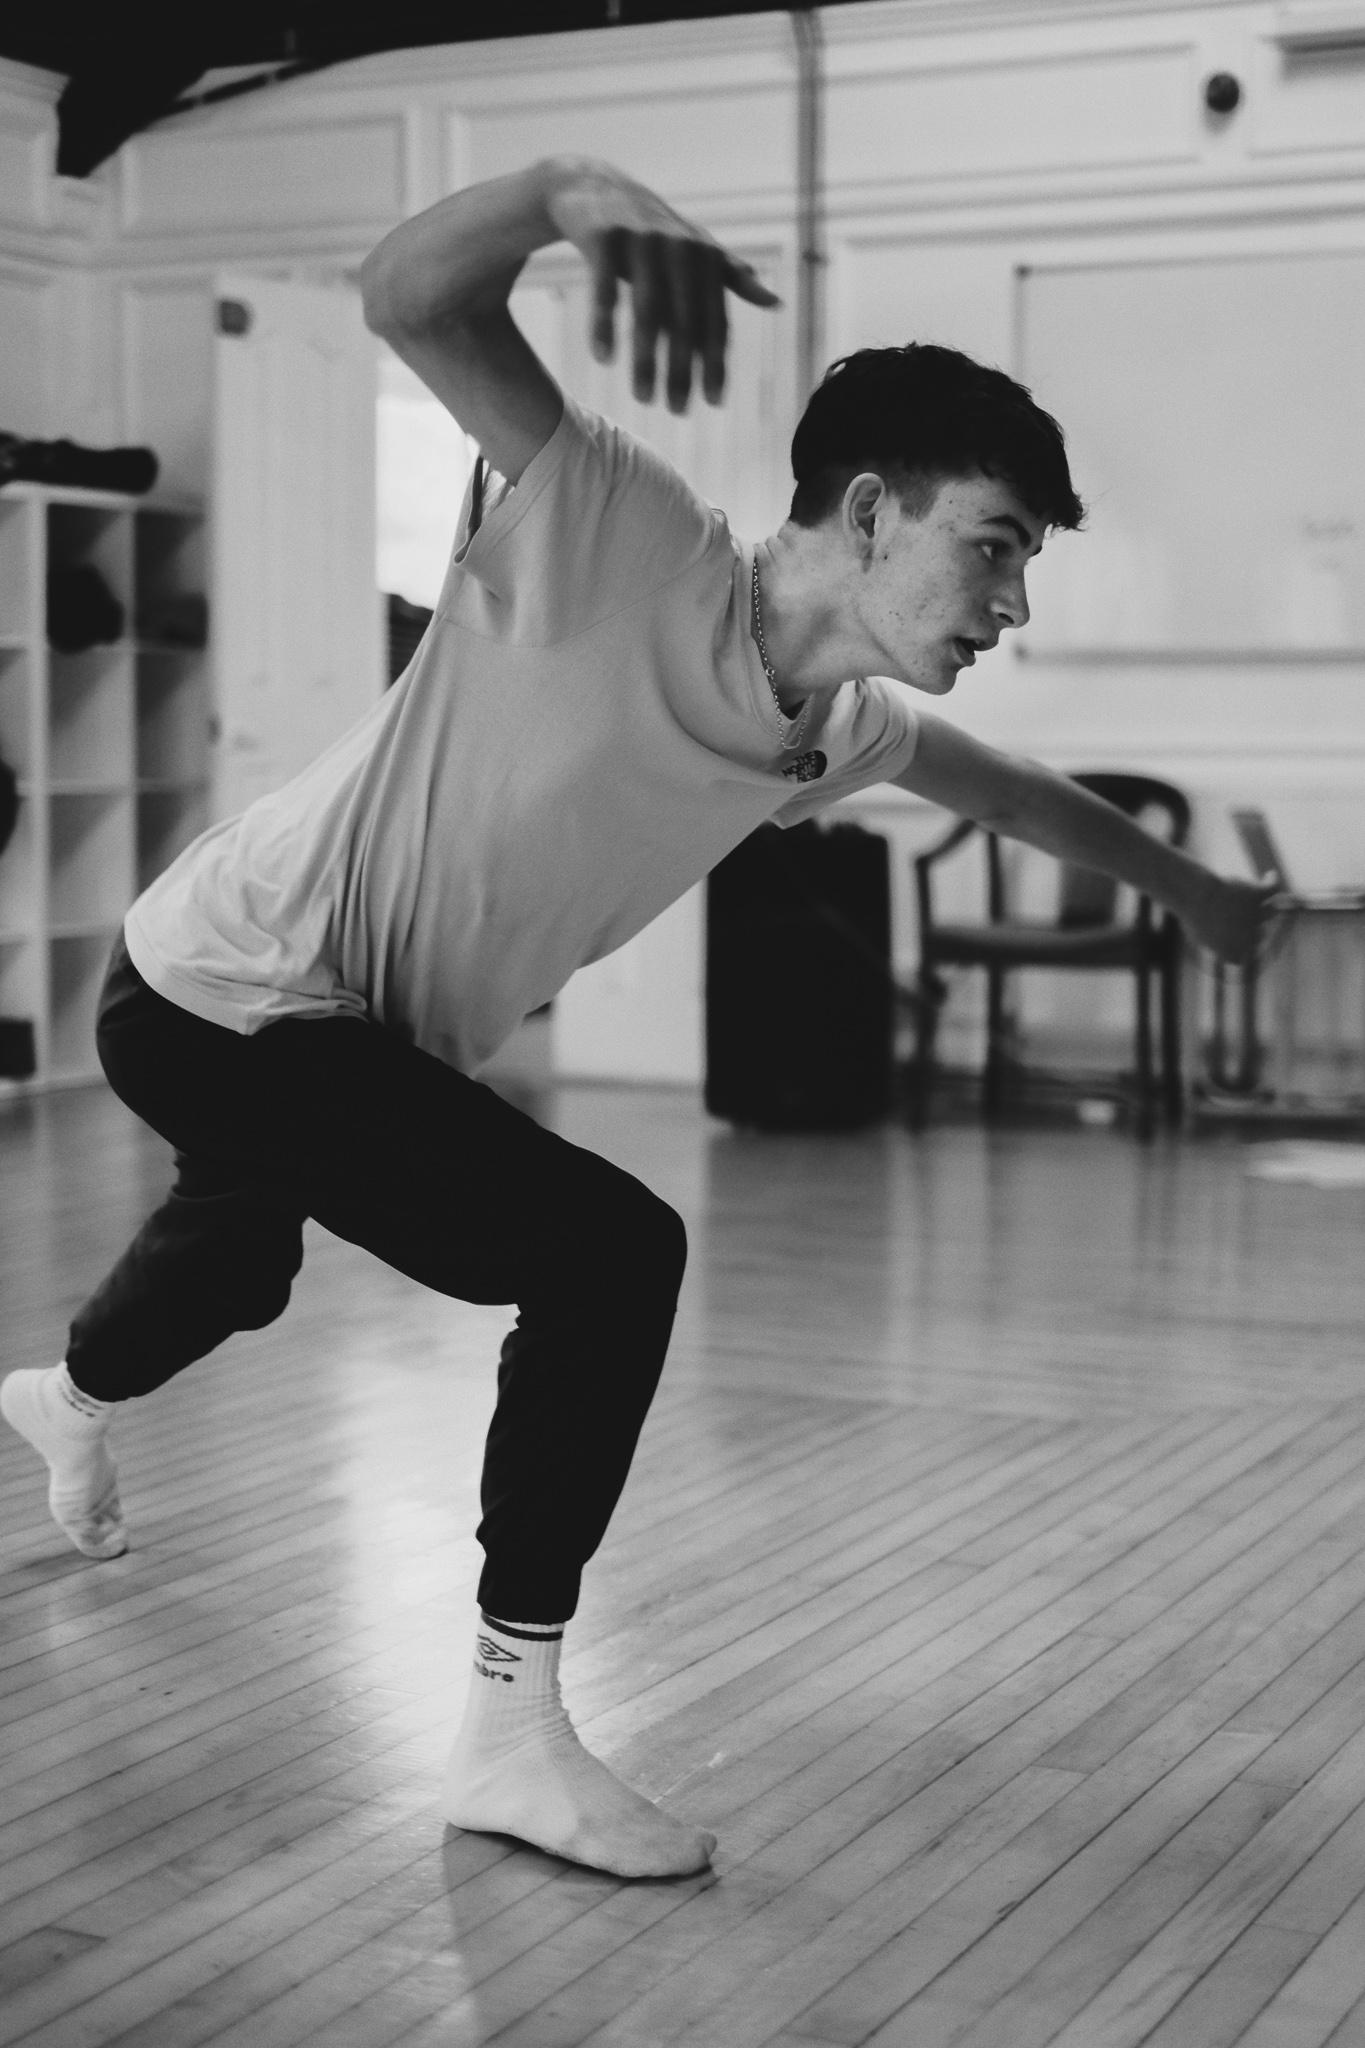 A teenage boy lunges forward during a dance rehearsal